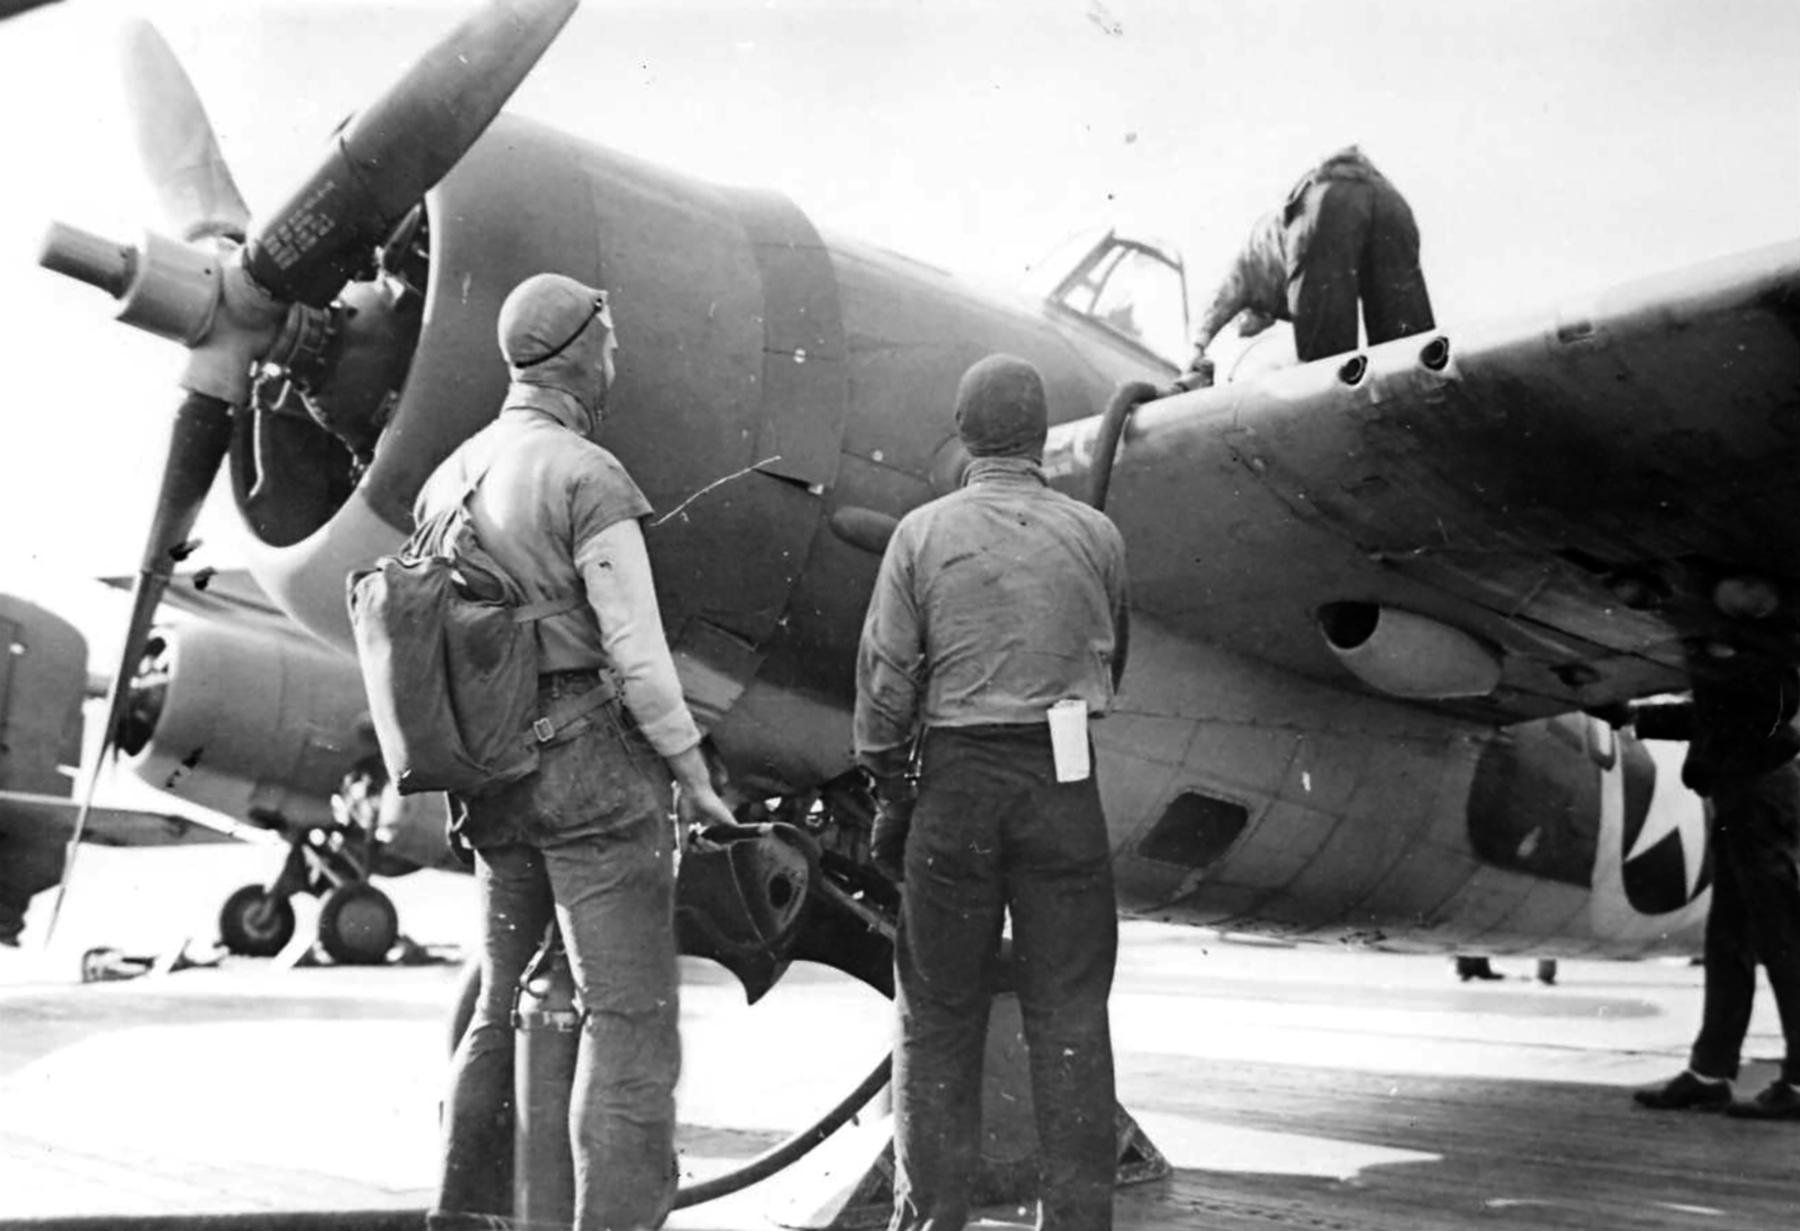 Grumman F4F 4 Wildcat VF 9 Black 9F20 or VF41 refueling after first strike CV 4 USS Ranger Nov 1942 01